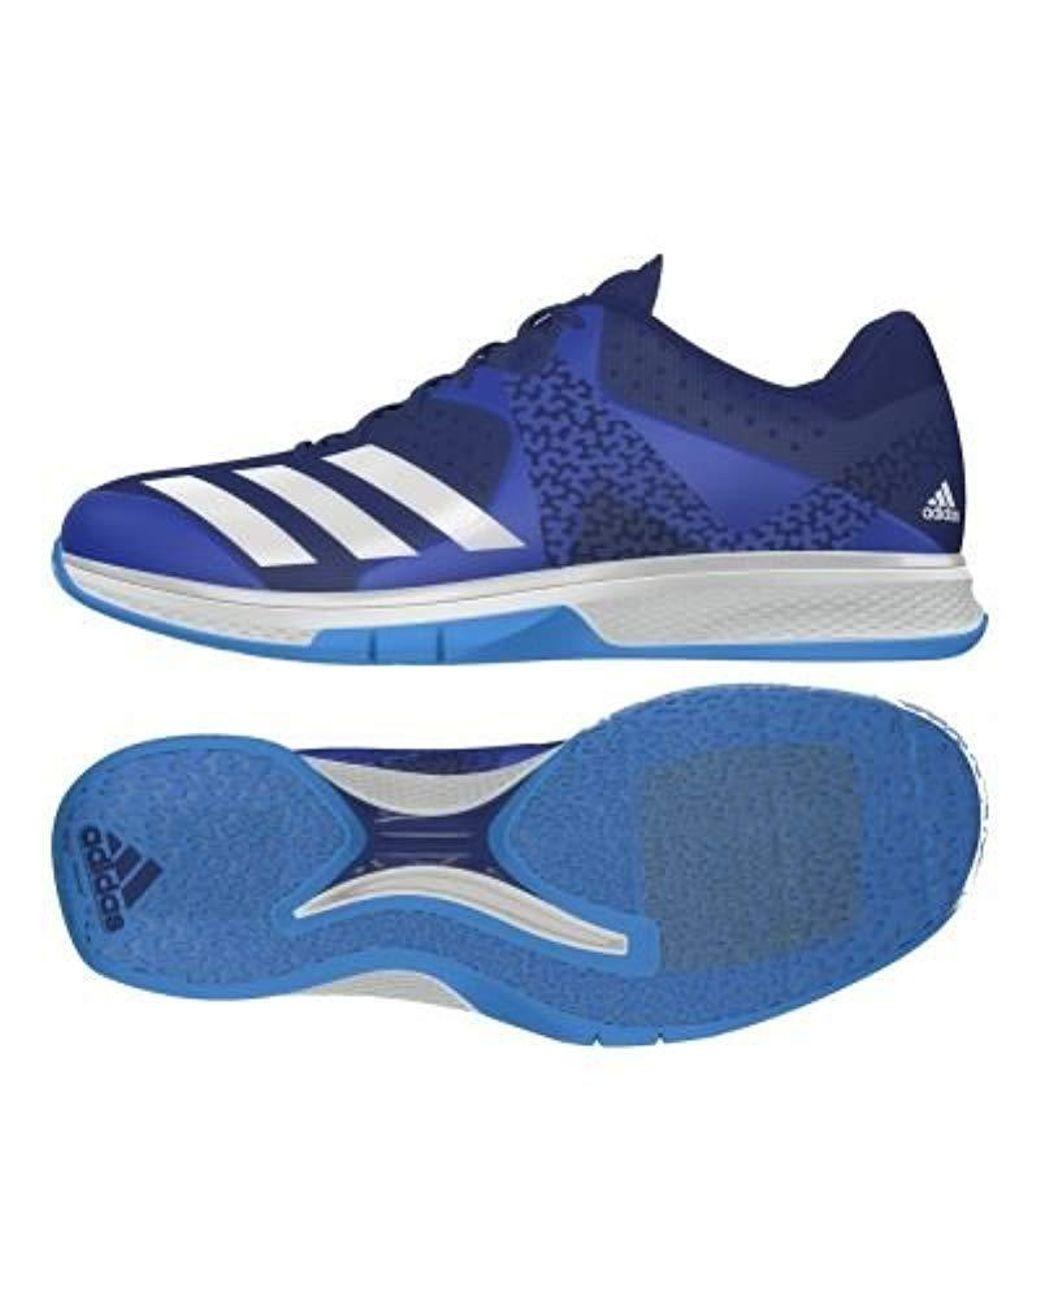 Men's Handball Performance Counterblast Shoes S Blue mN0wn8